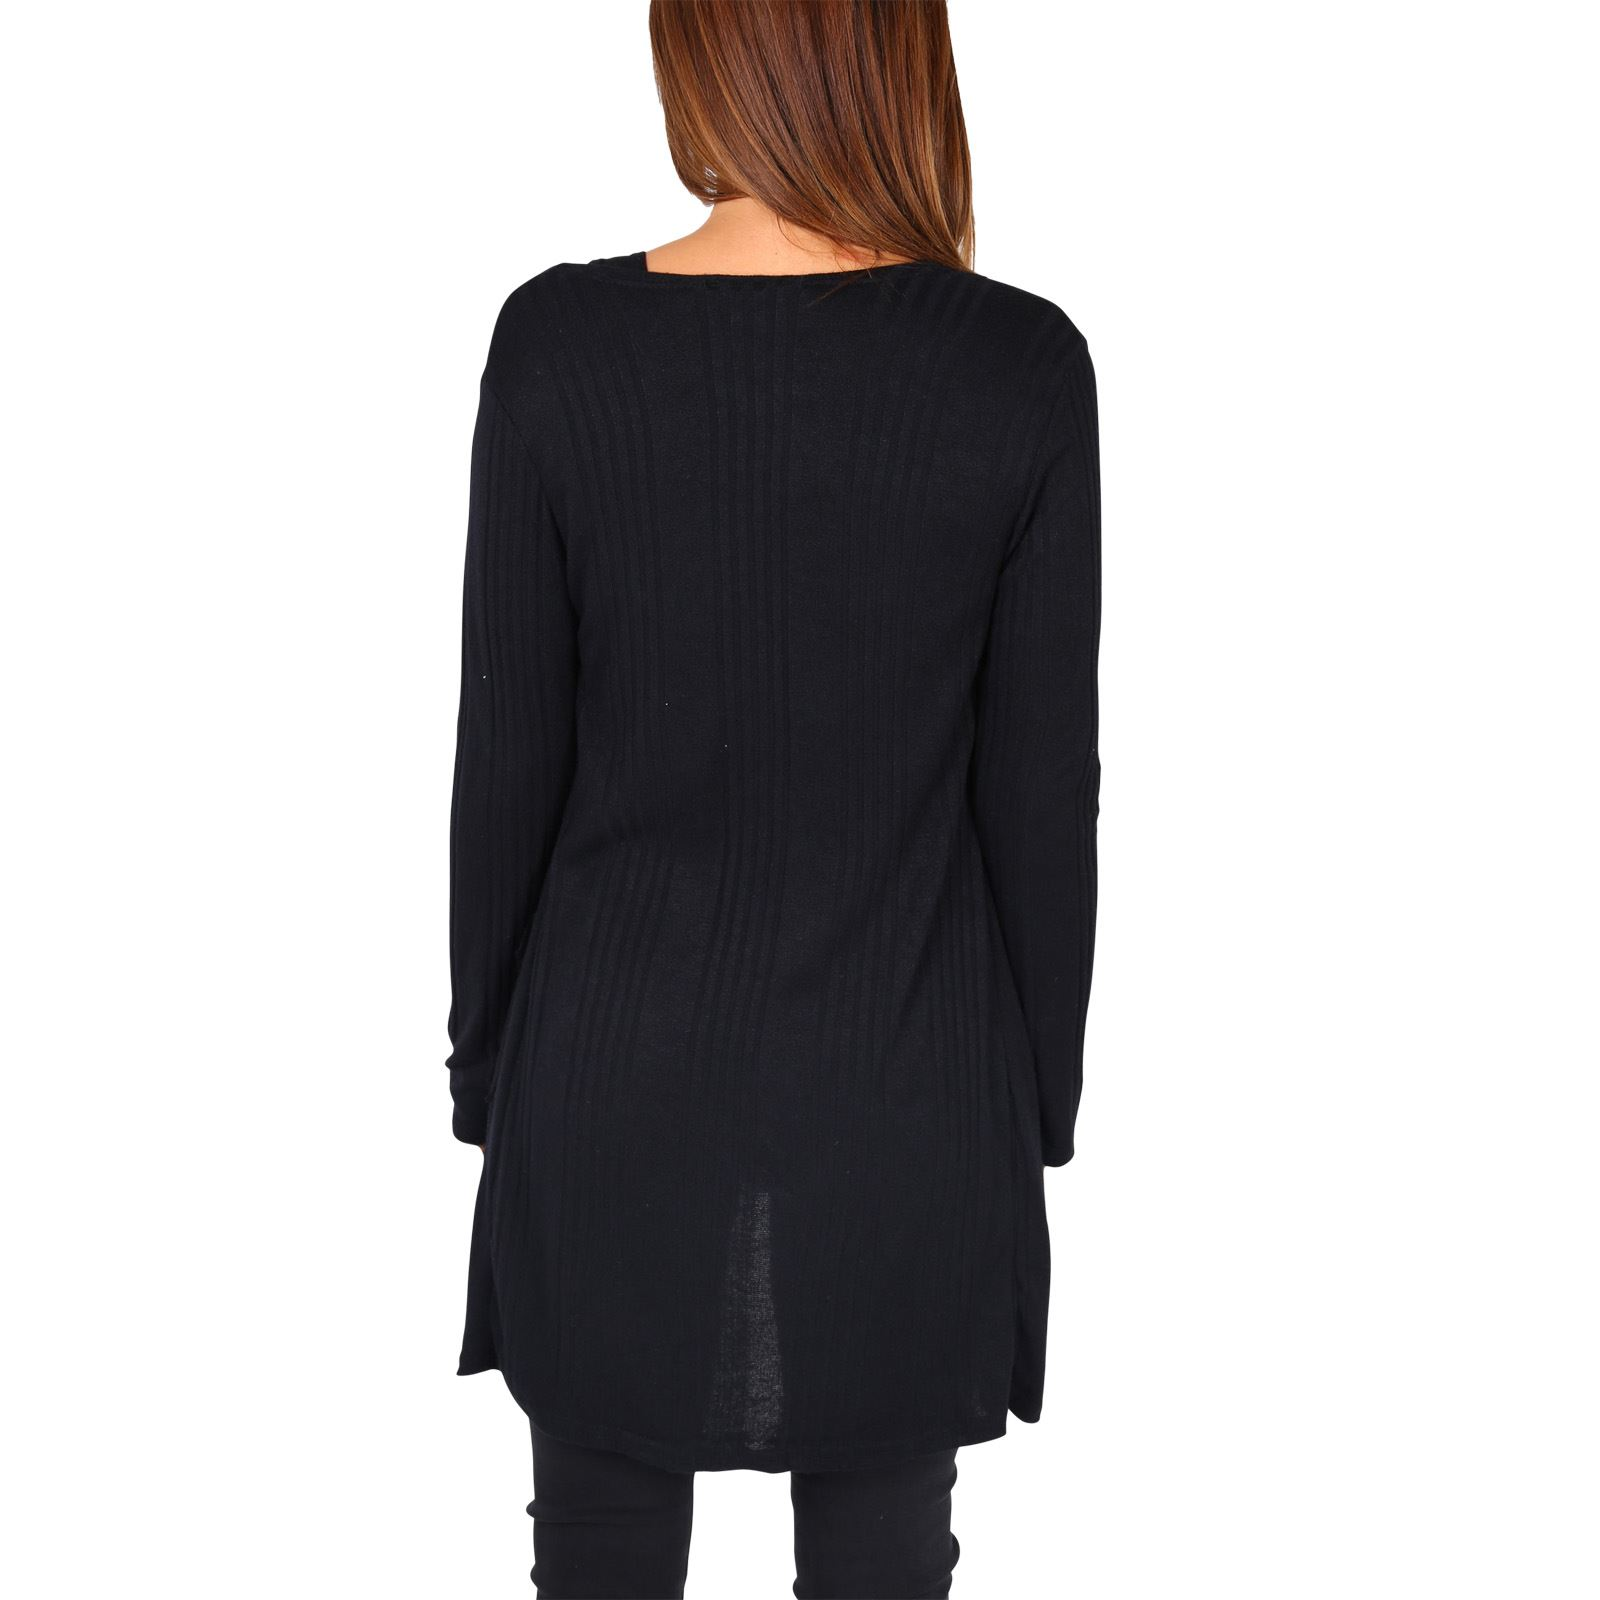 Femmes-Cardigan-Gilet-Long-Manches-Longues-Elegant-Mode-Basique-Casual-Jumper miniature 7